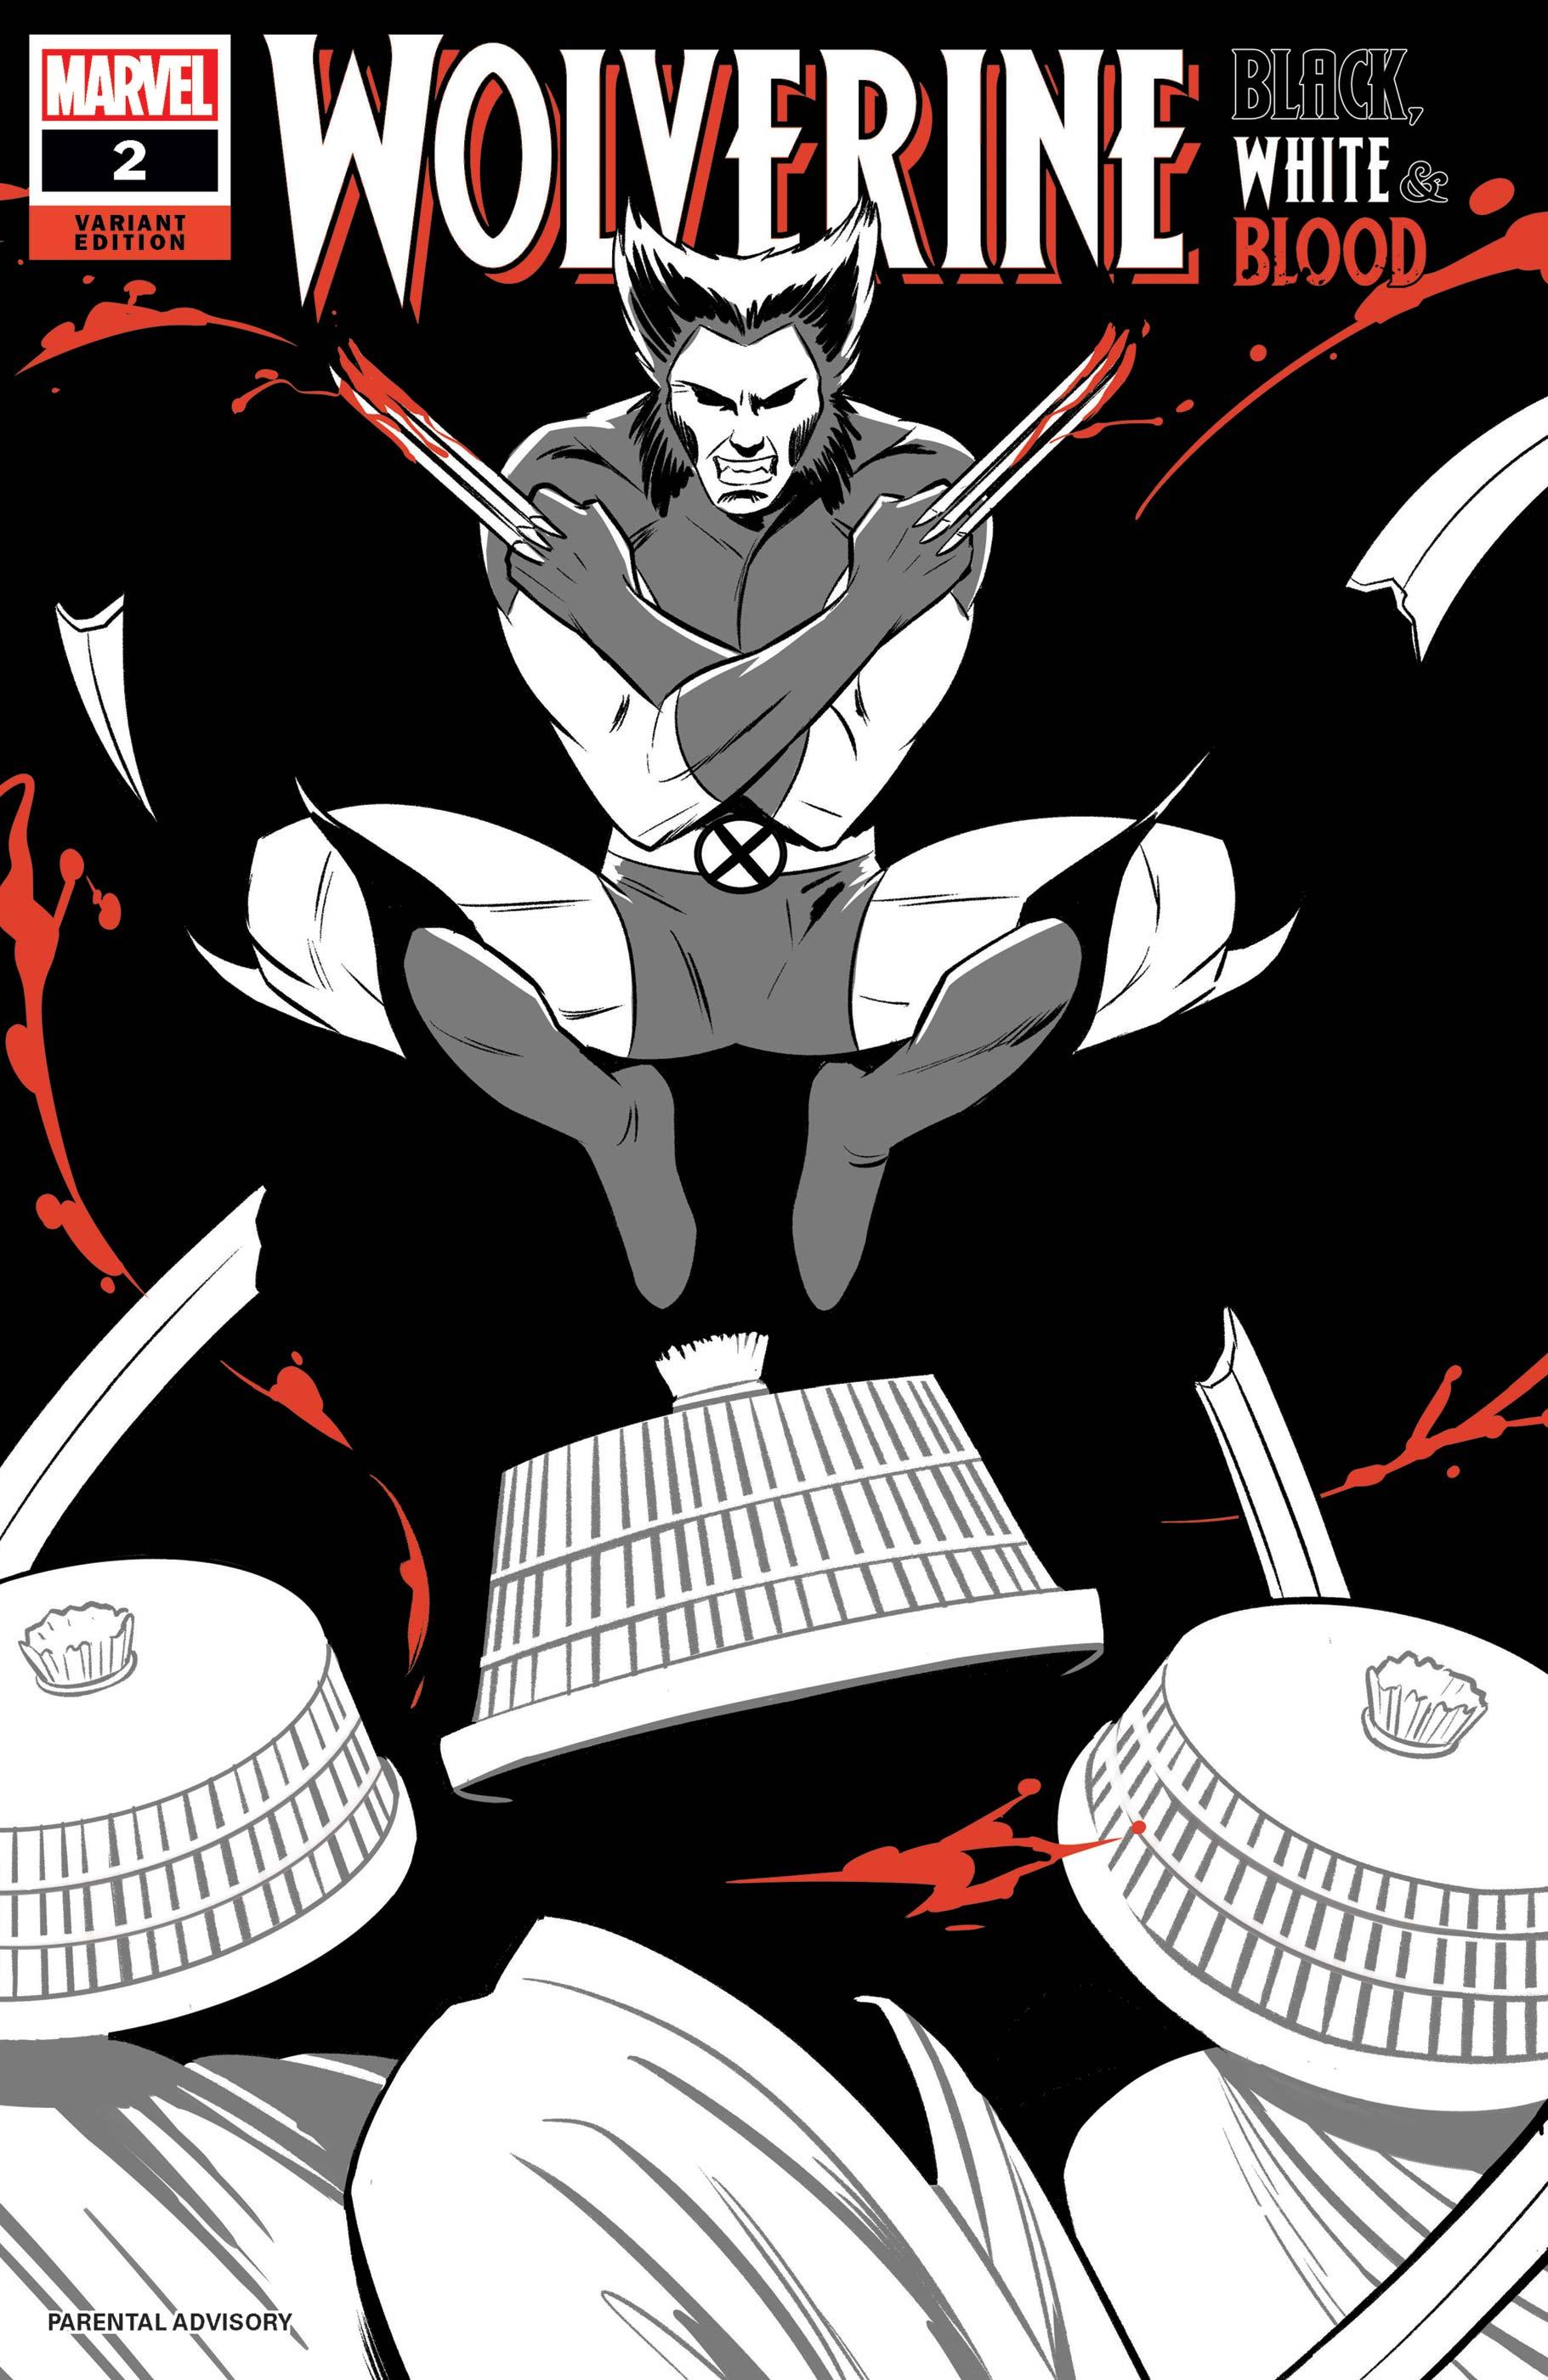 Wolverine: Black, White & Blood (2020) #2 (Variant)